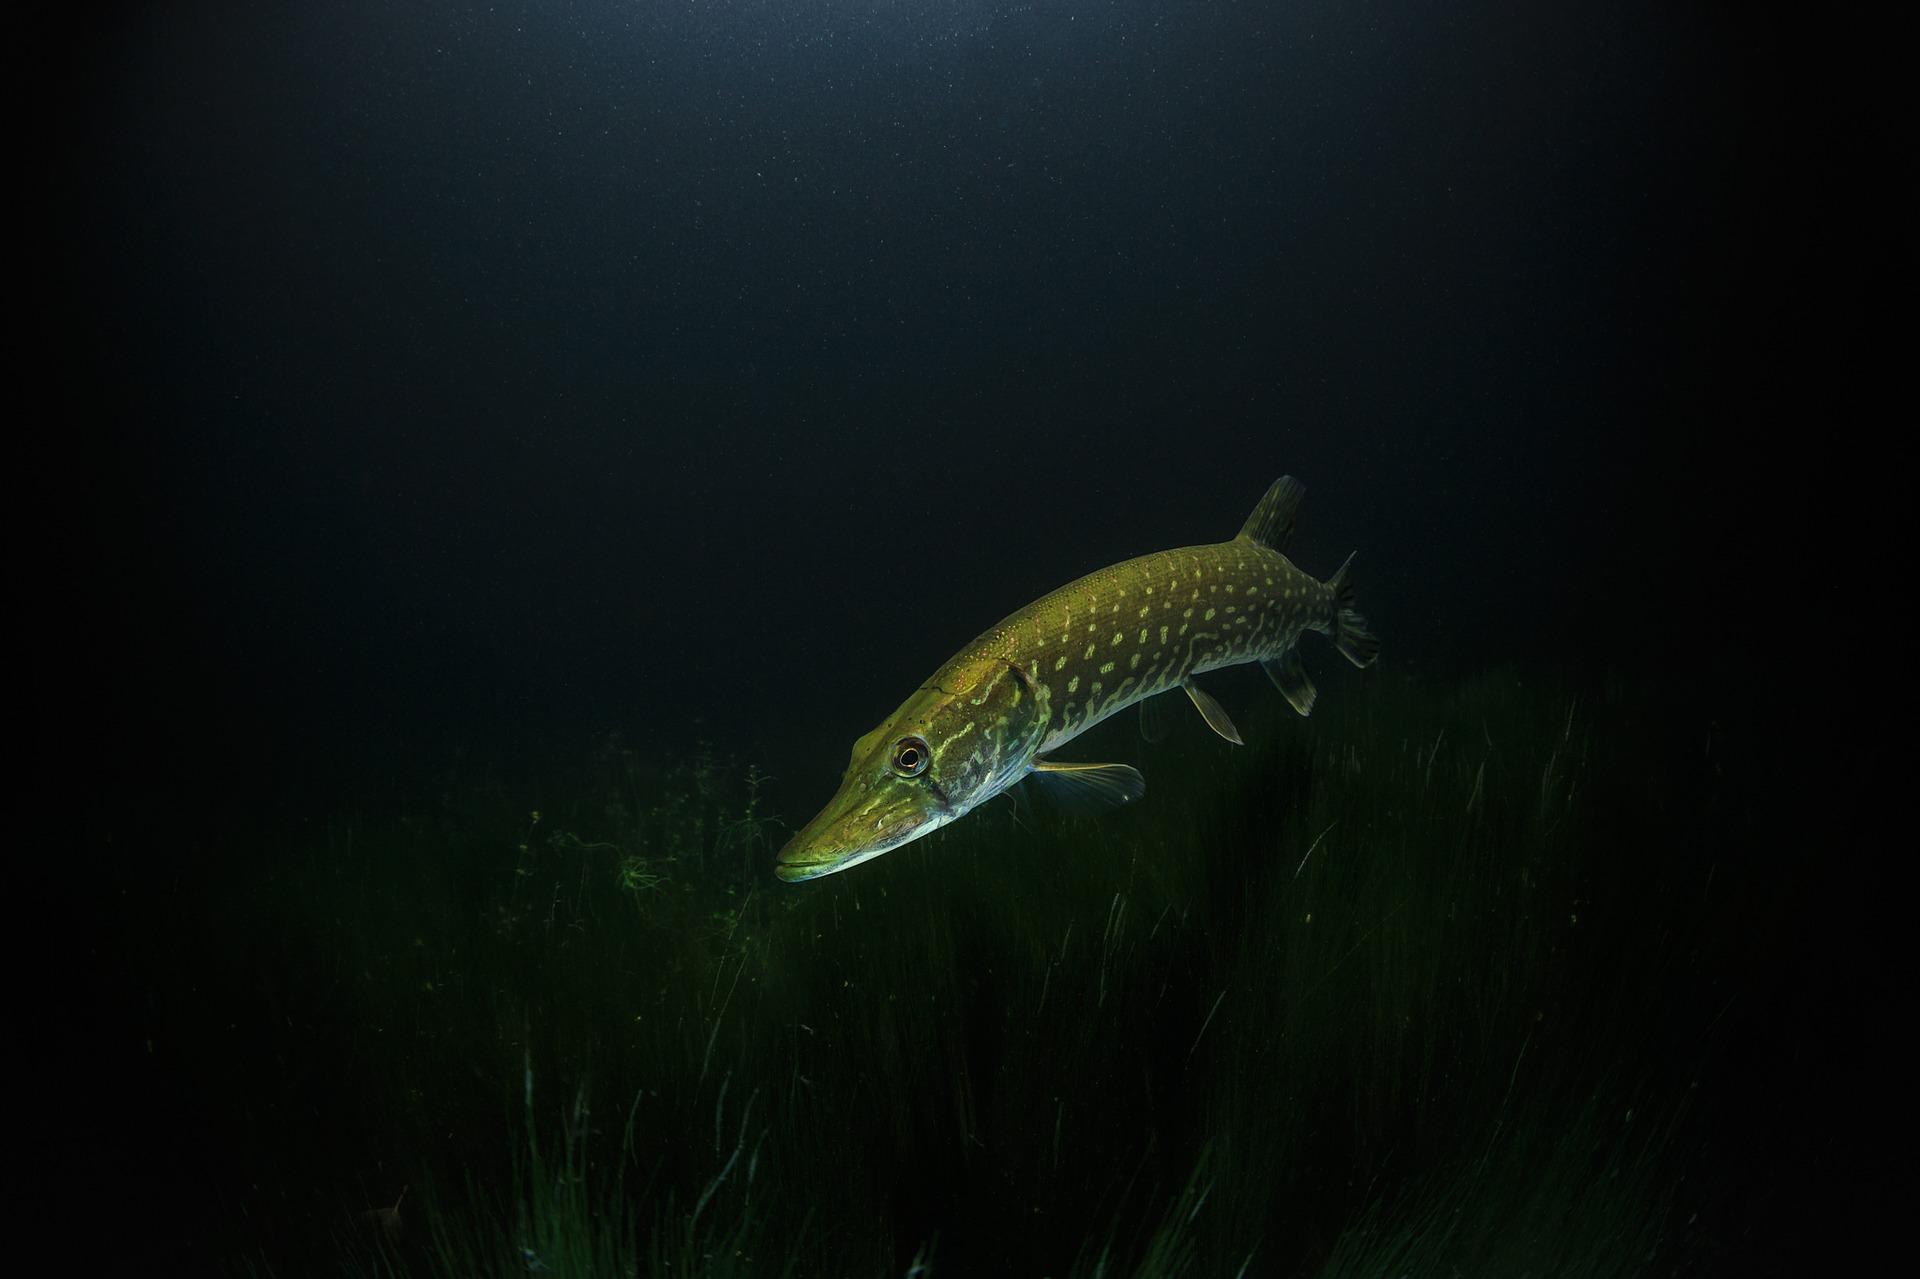 Pesca de lucios en verano